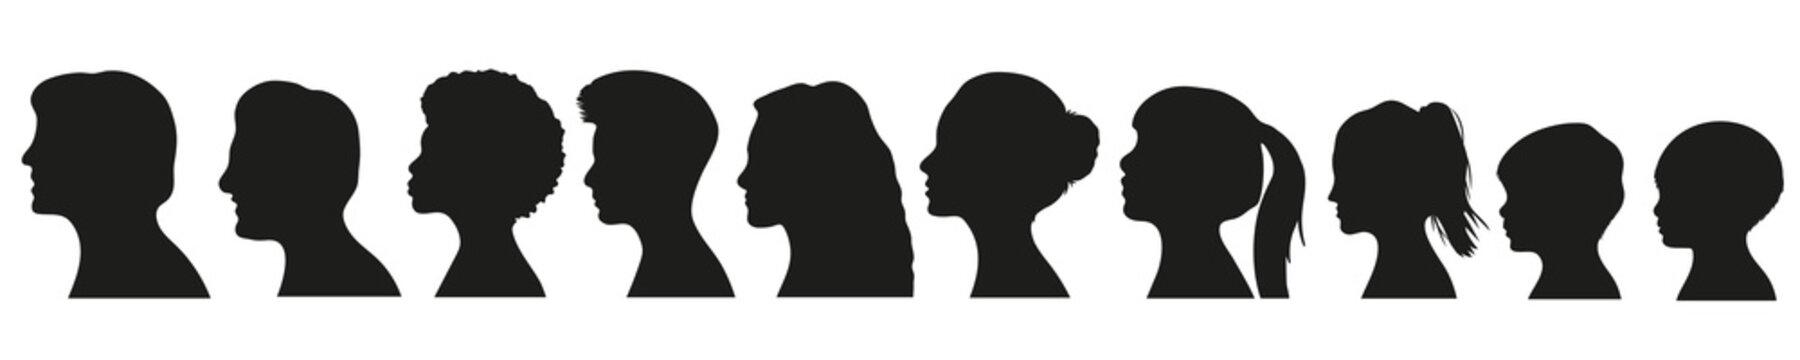 Frauen Generationen Set